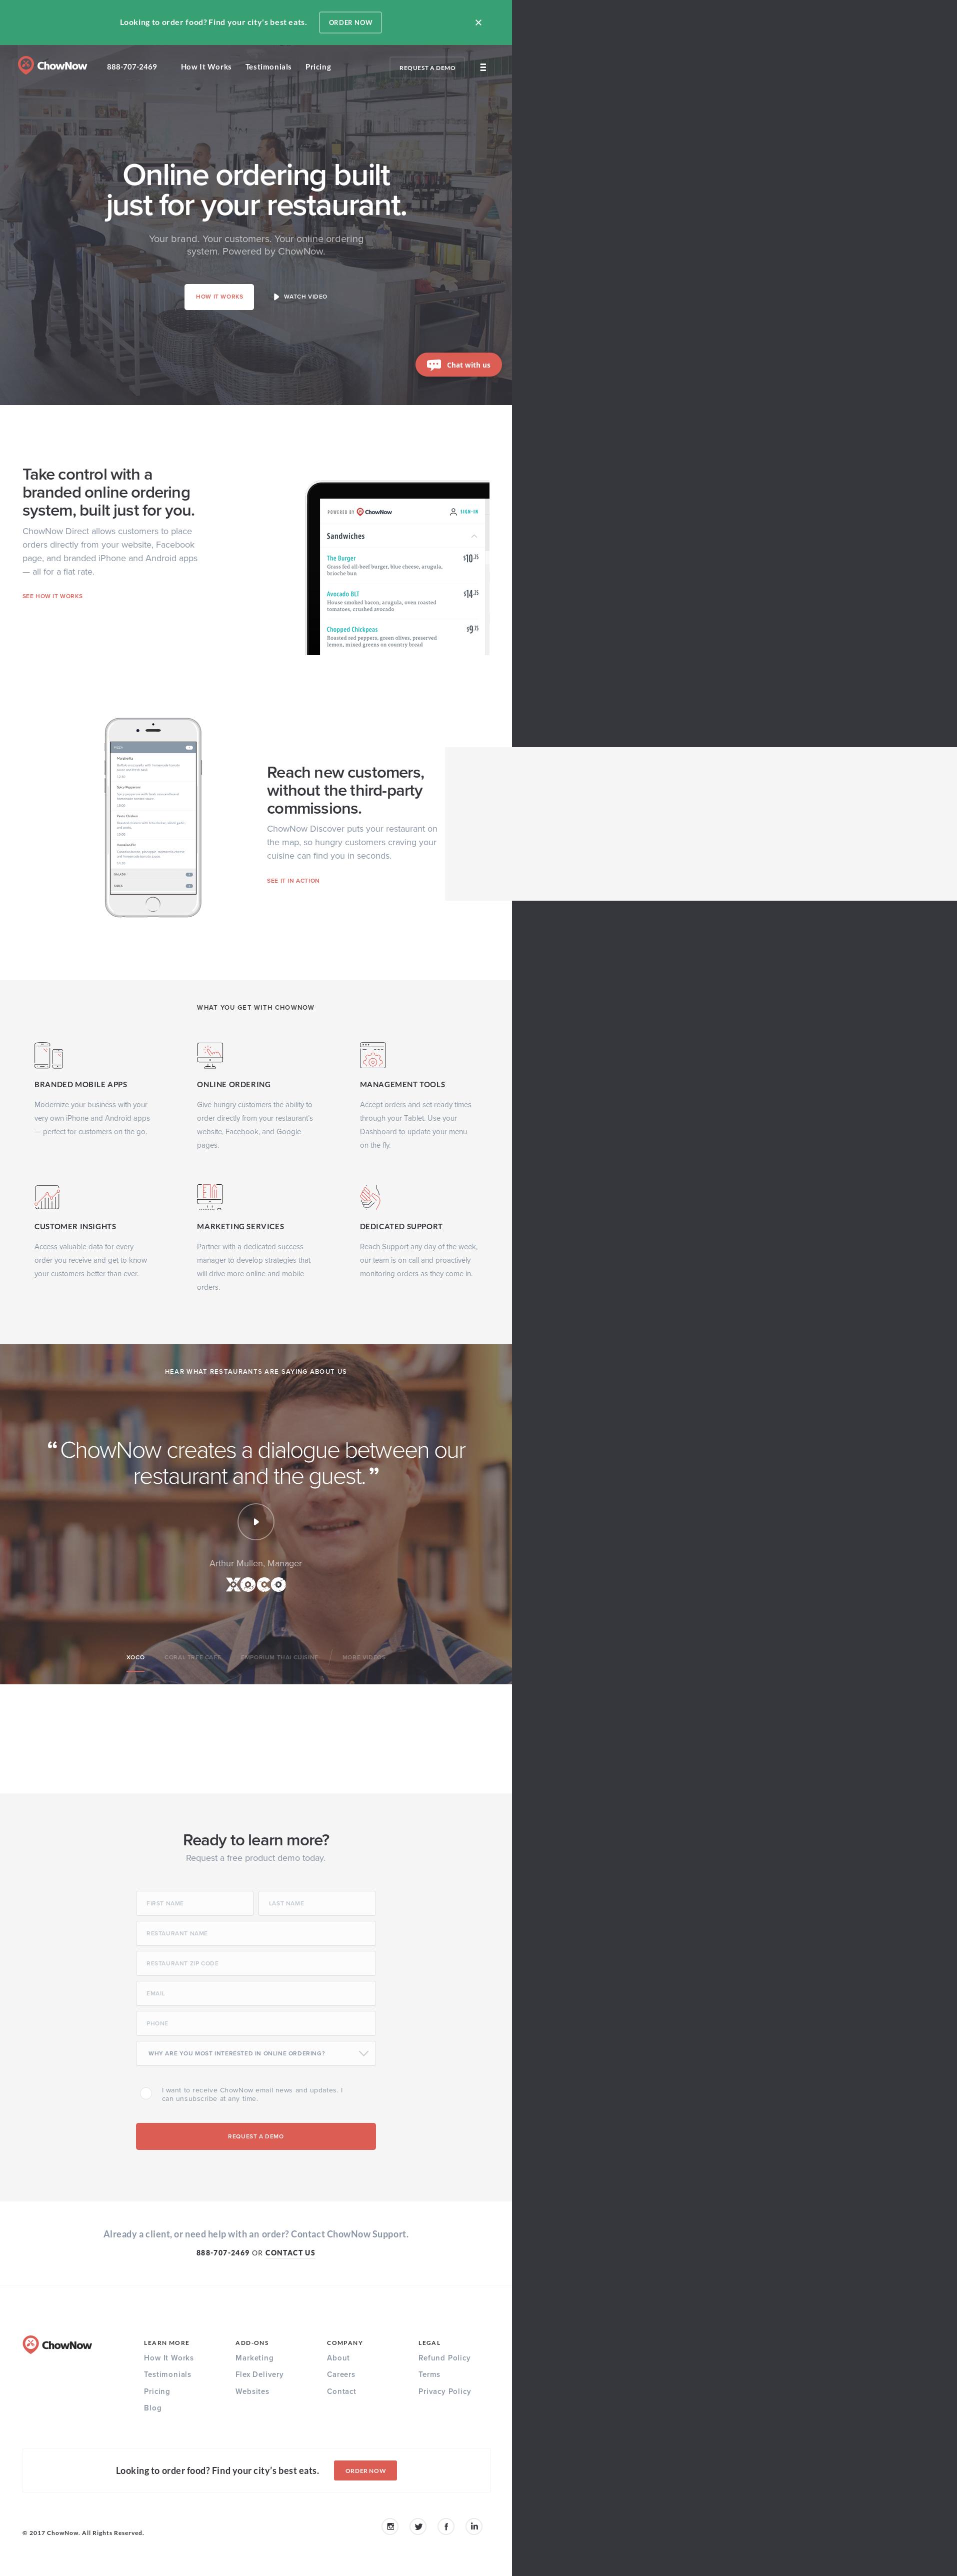 Chownow Web Design